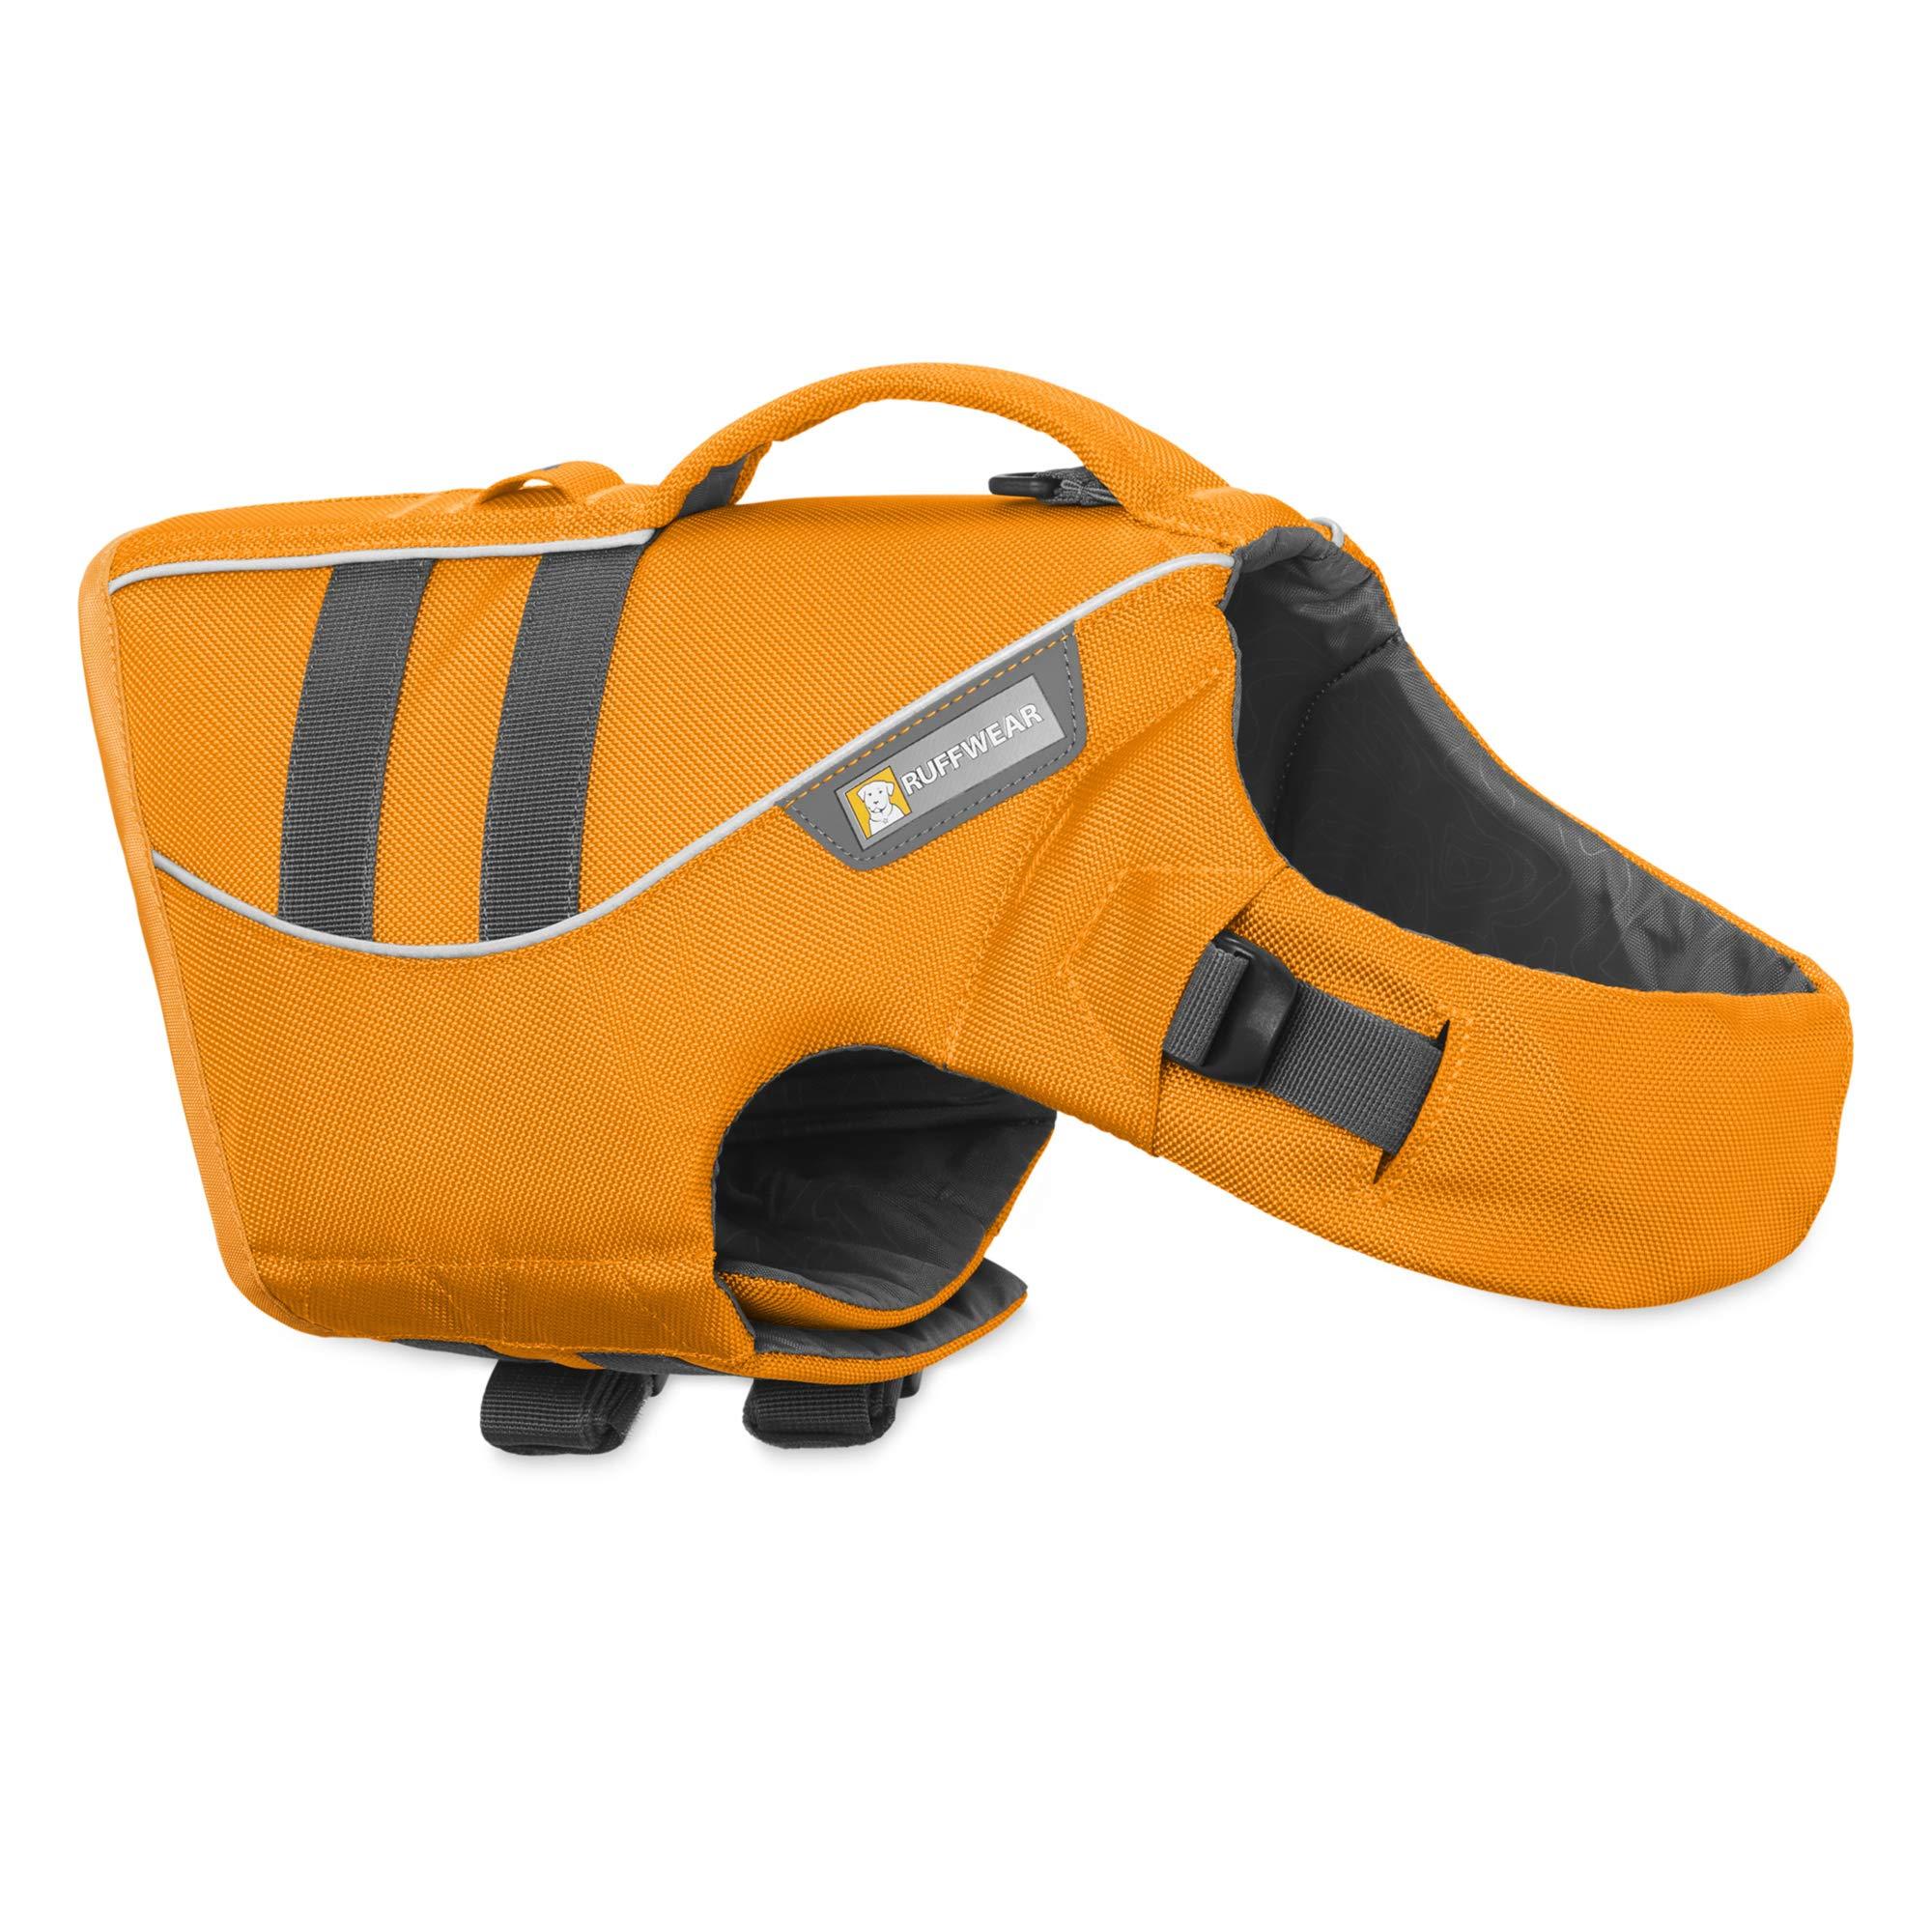 RUFFWEAR - Float Coat Dog Life Jacket for Swimming, Adjustable and Reflective, Wave Orange, X-Large by RUFFWEAR